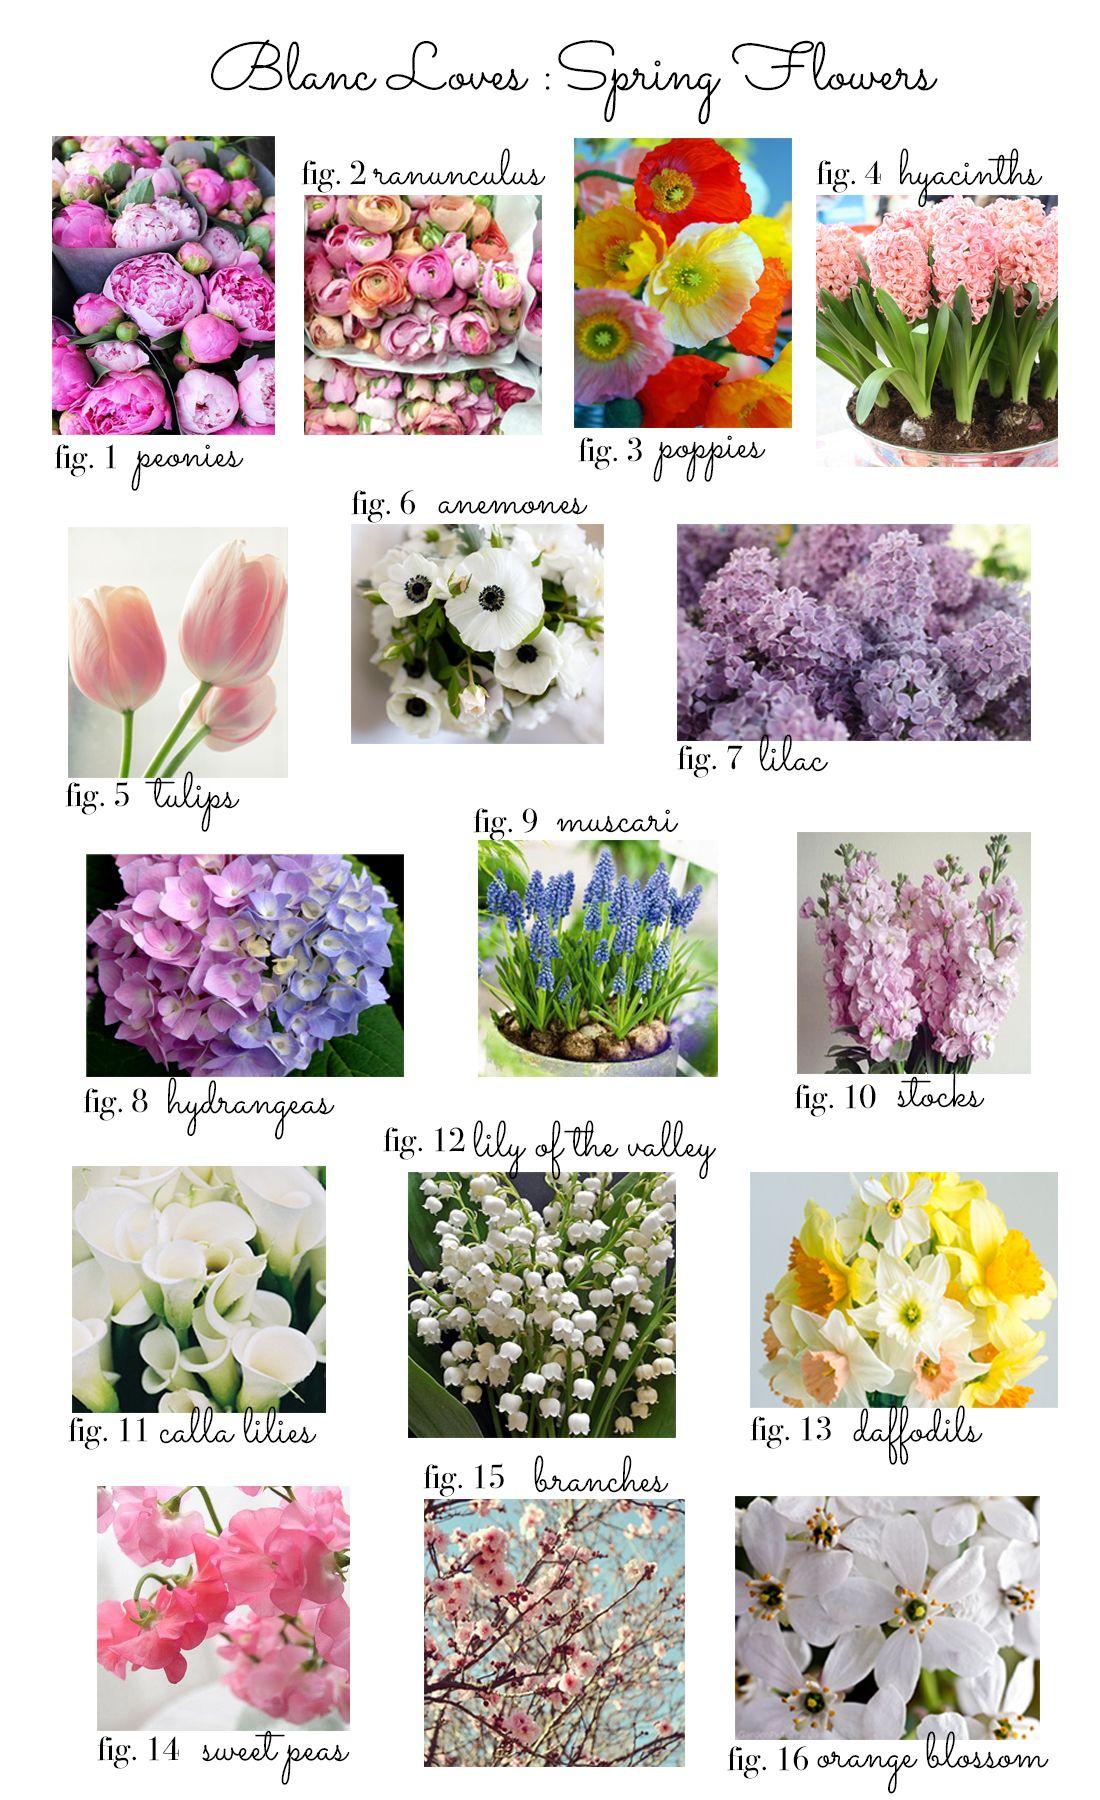 Blanc Loves: Spring Weddings